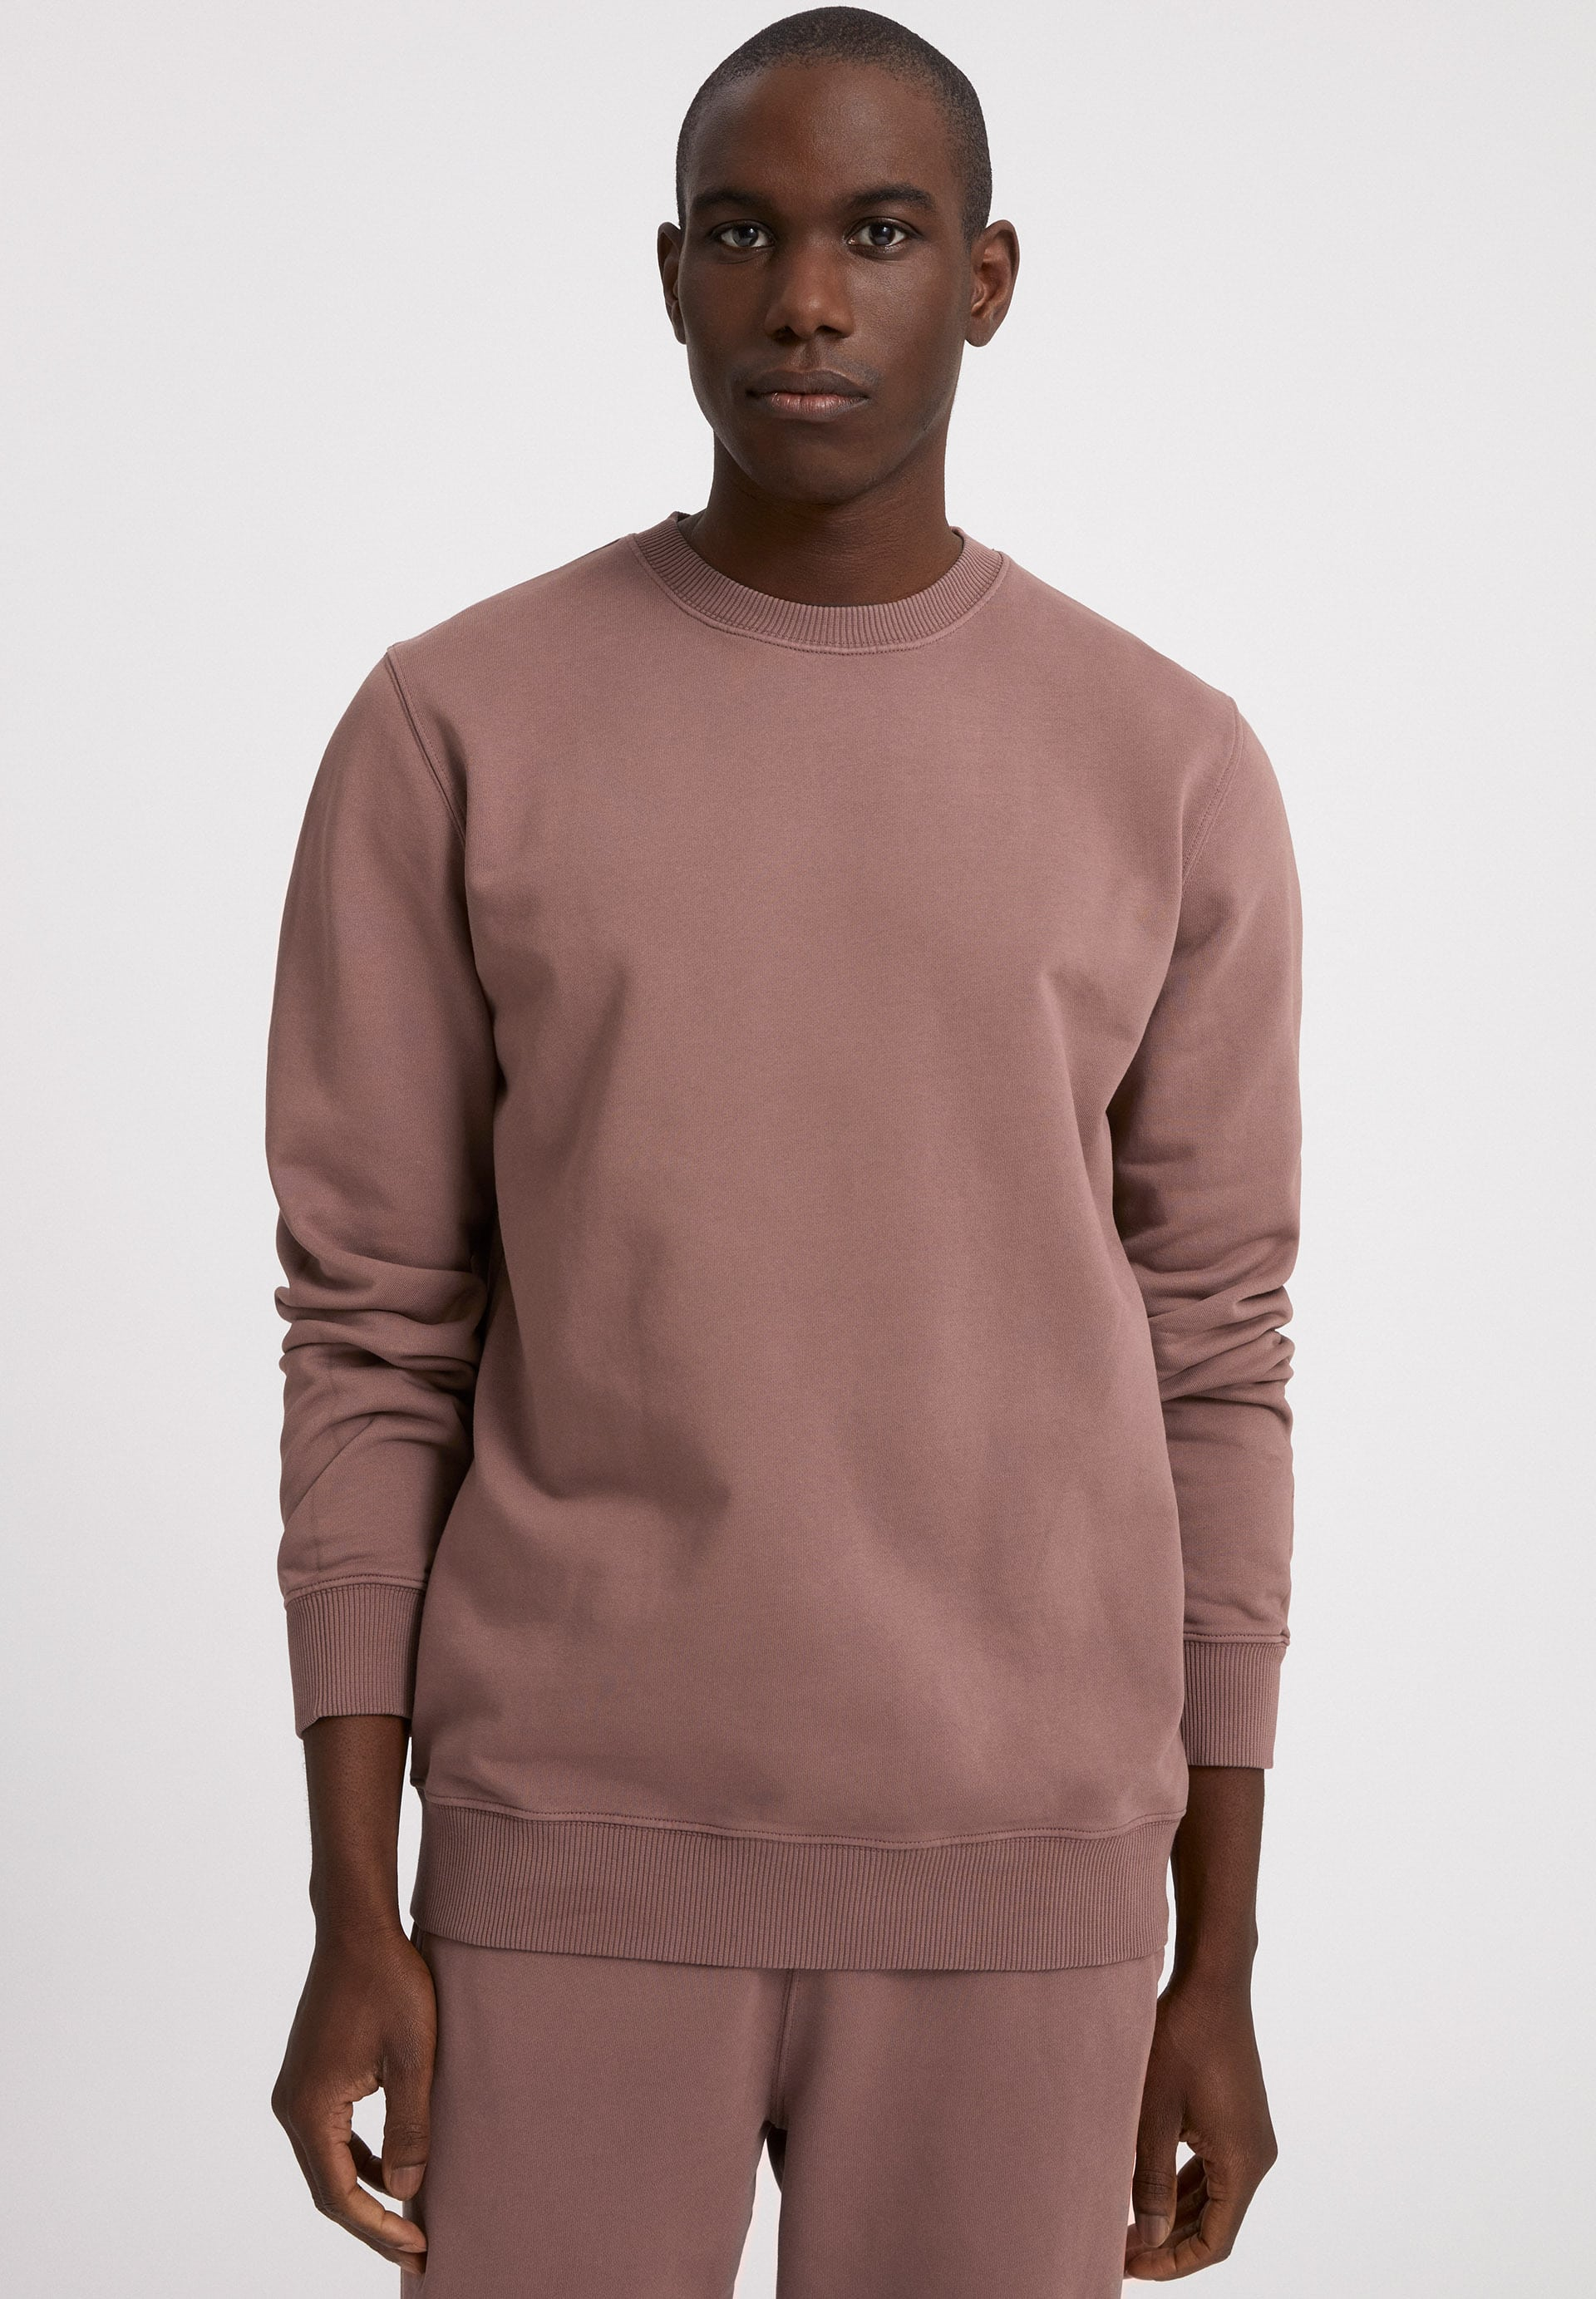 MAALTE EARTHCOLORS® Sweatshirt made of Organic Cotton